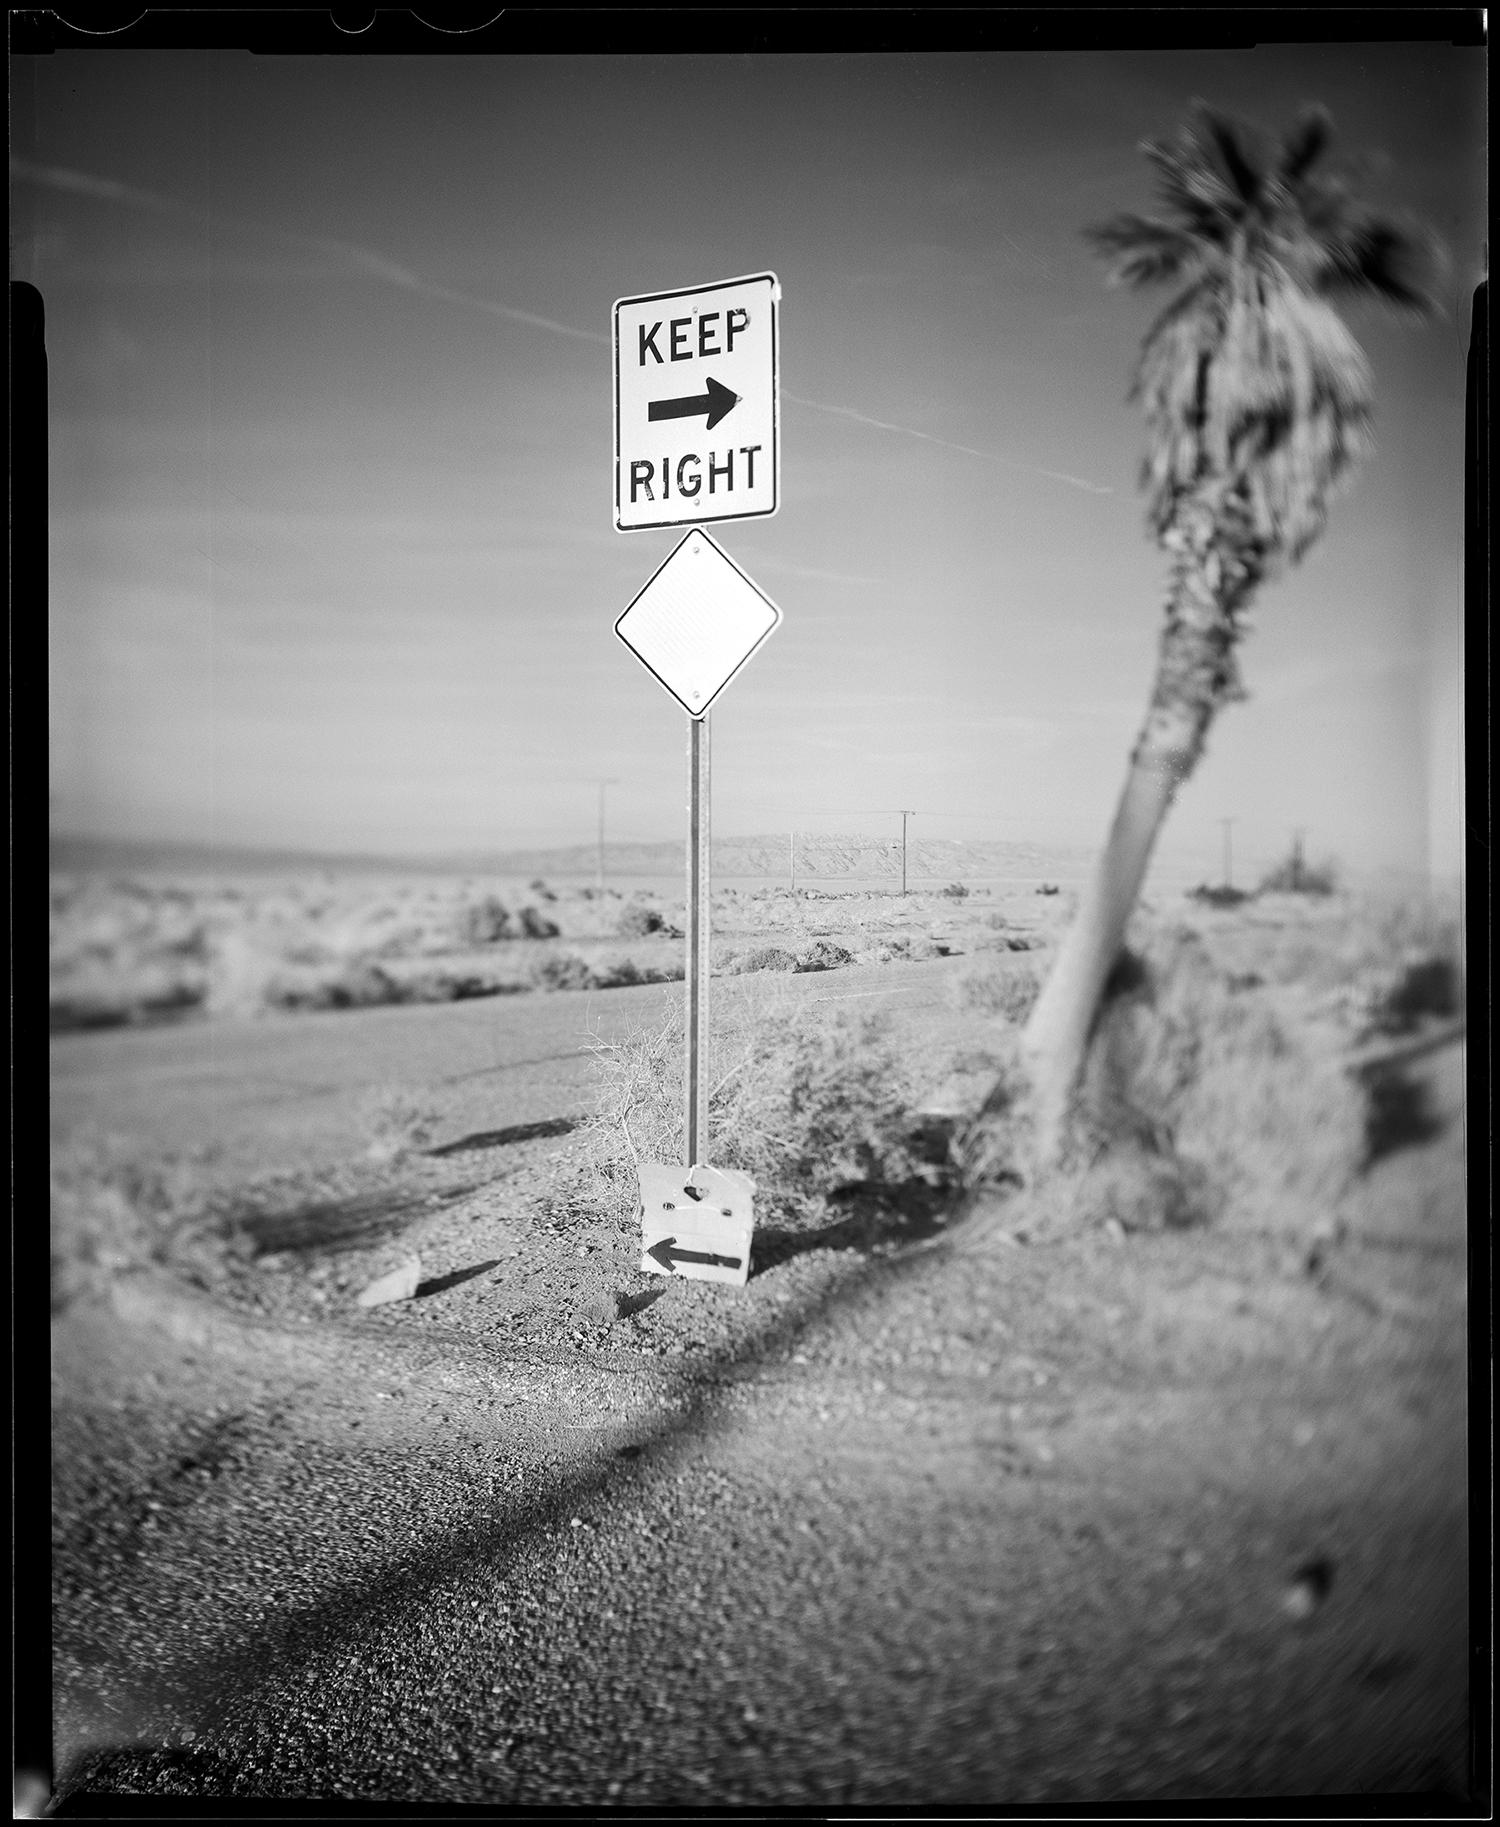 """Wanderlust. Salton City, California"" by Chrystal Nause"